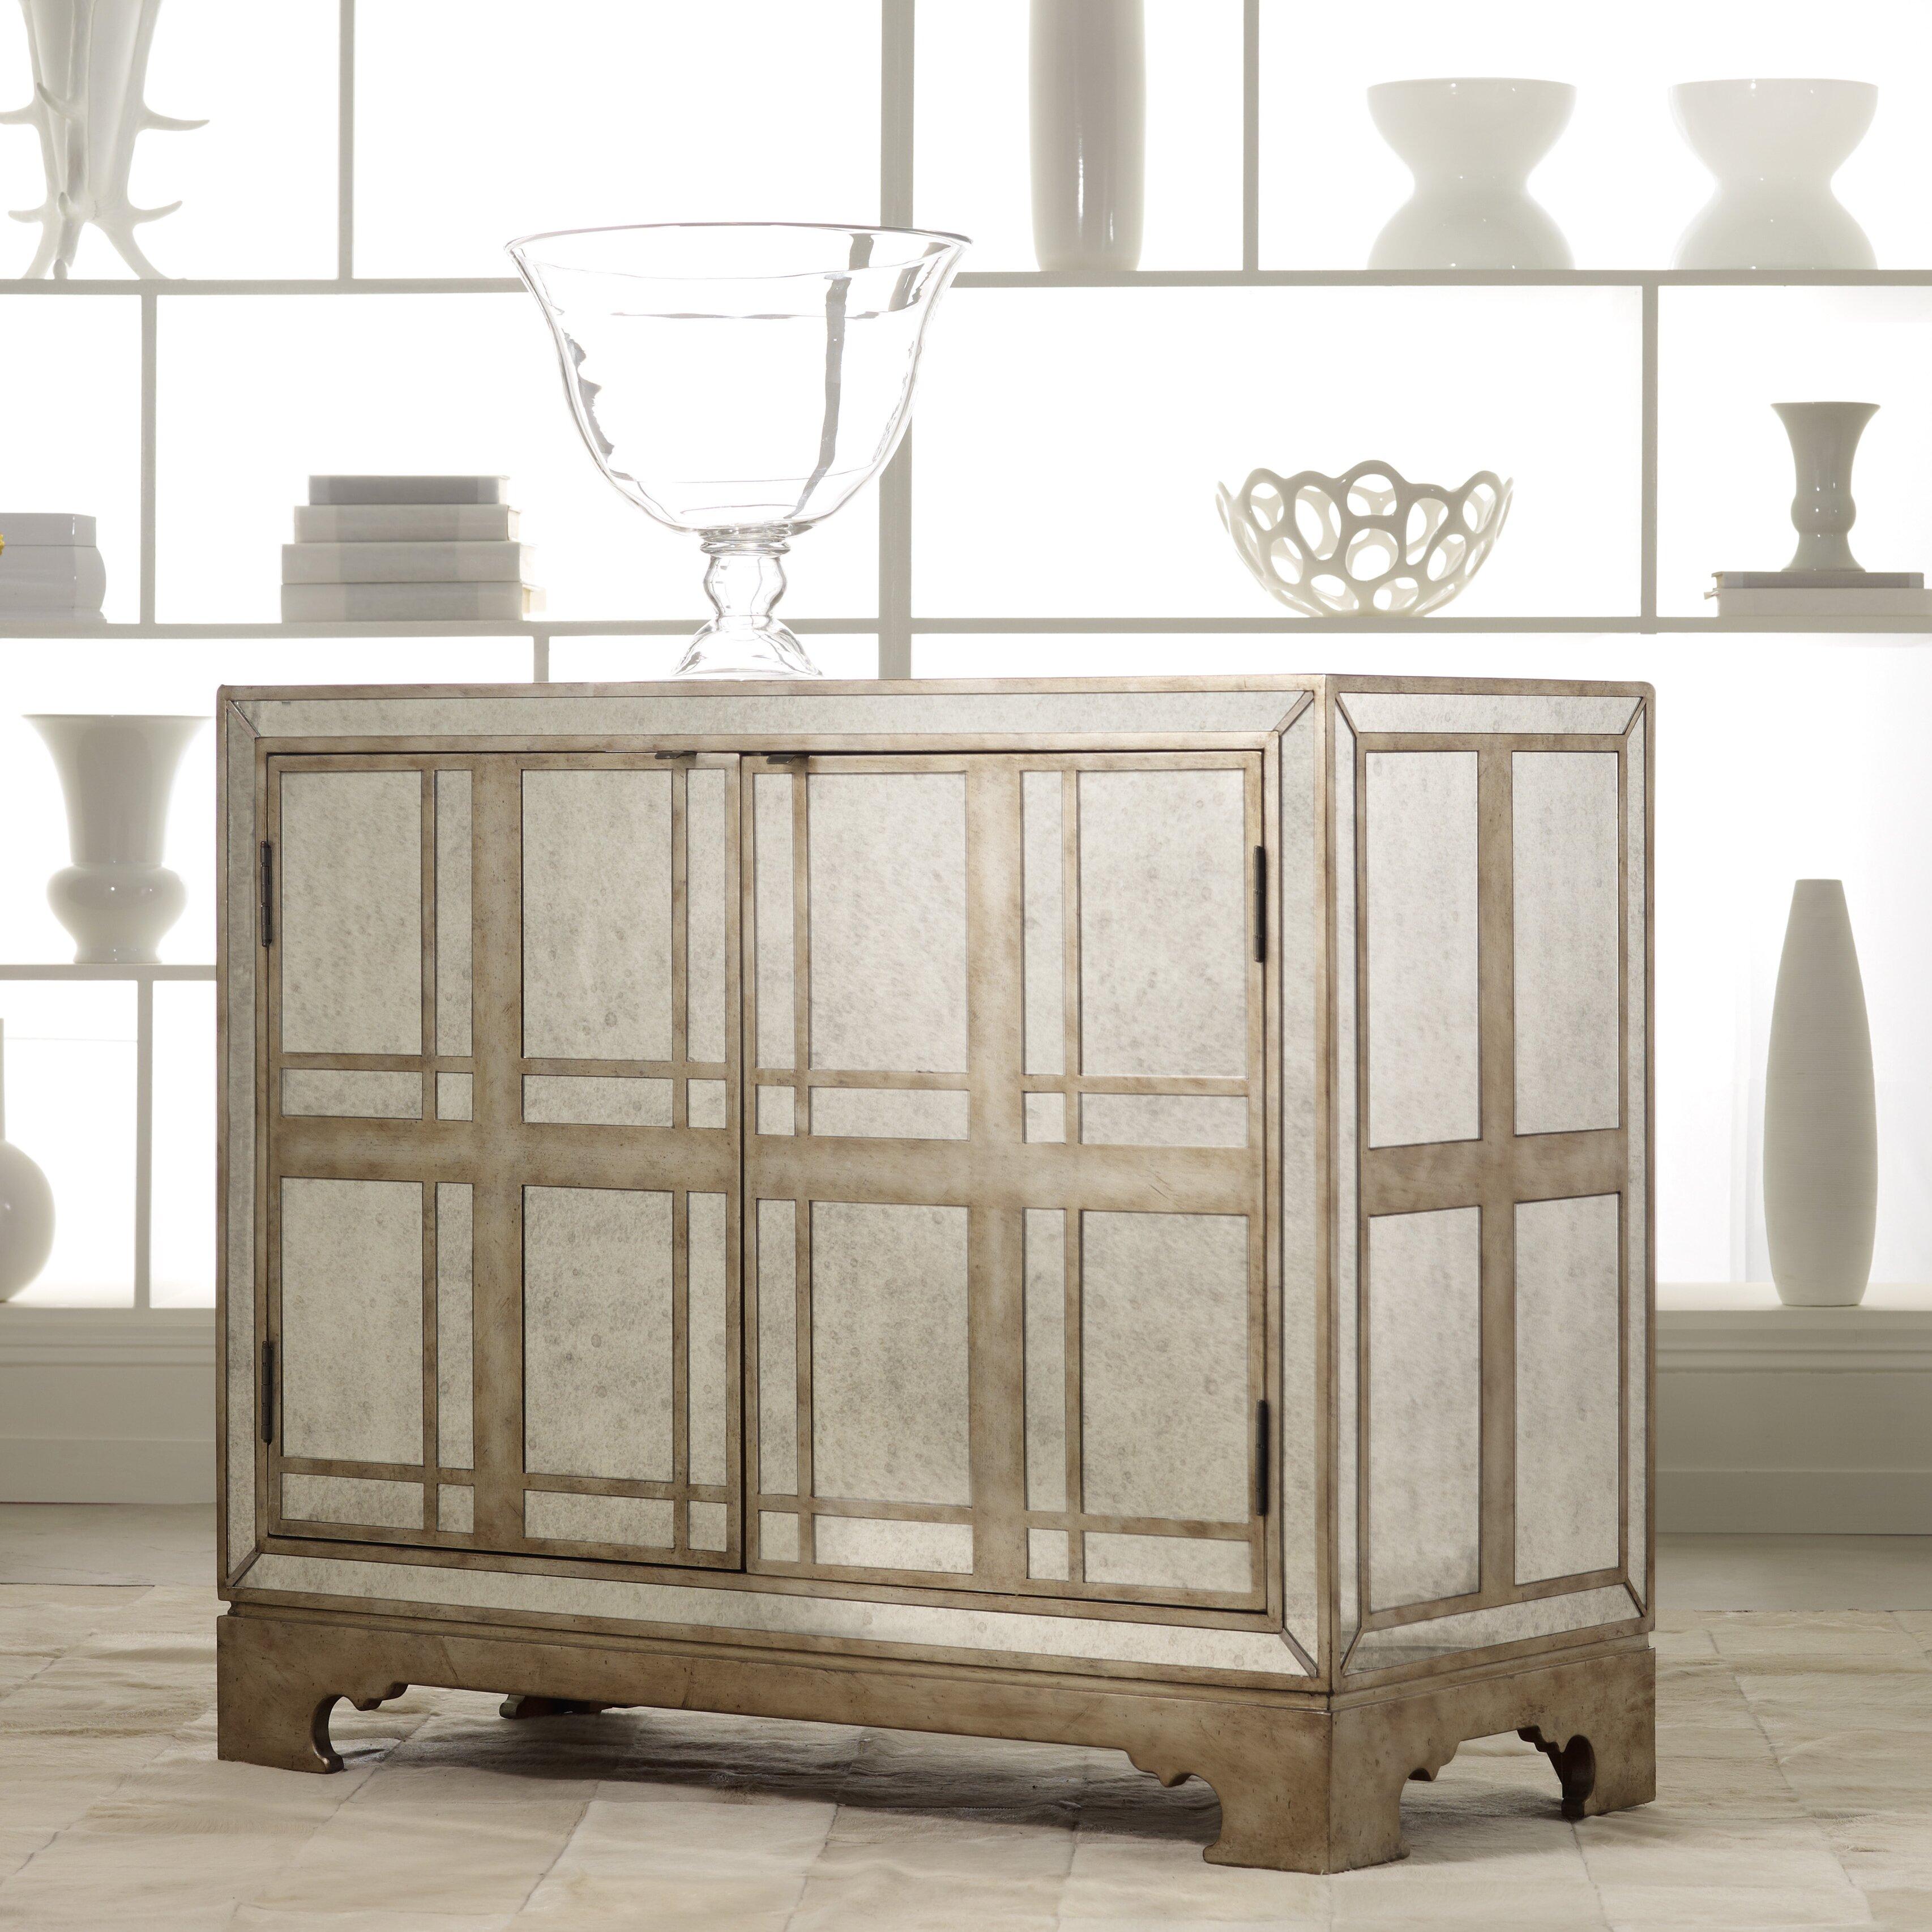 Hooker Furniture Melange Mirrored Sideboard & Reviews